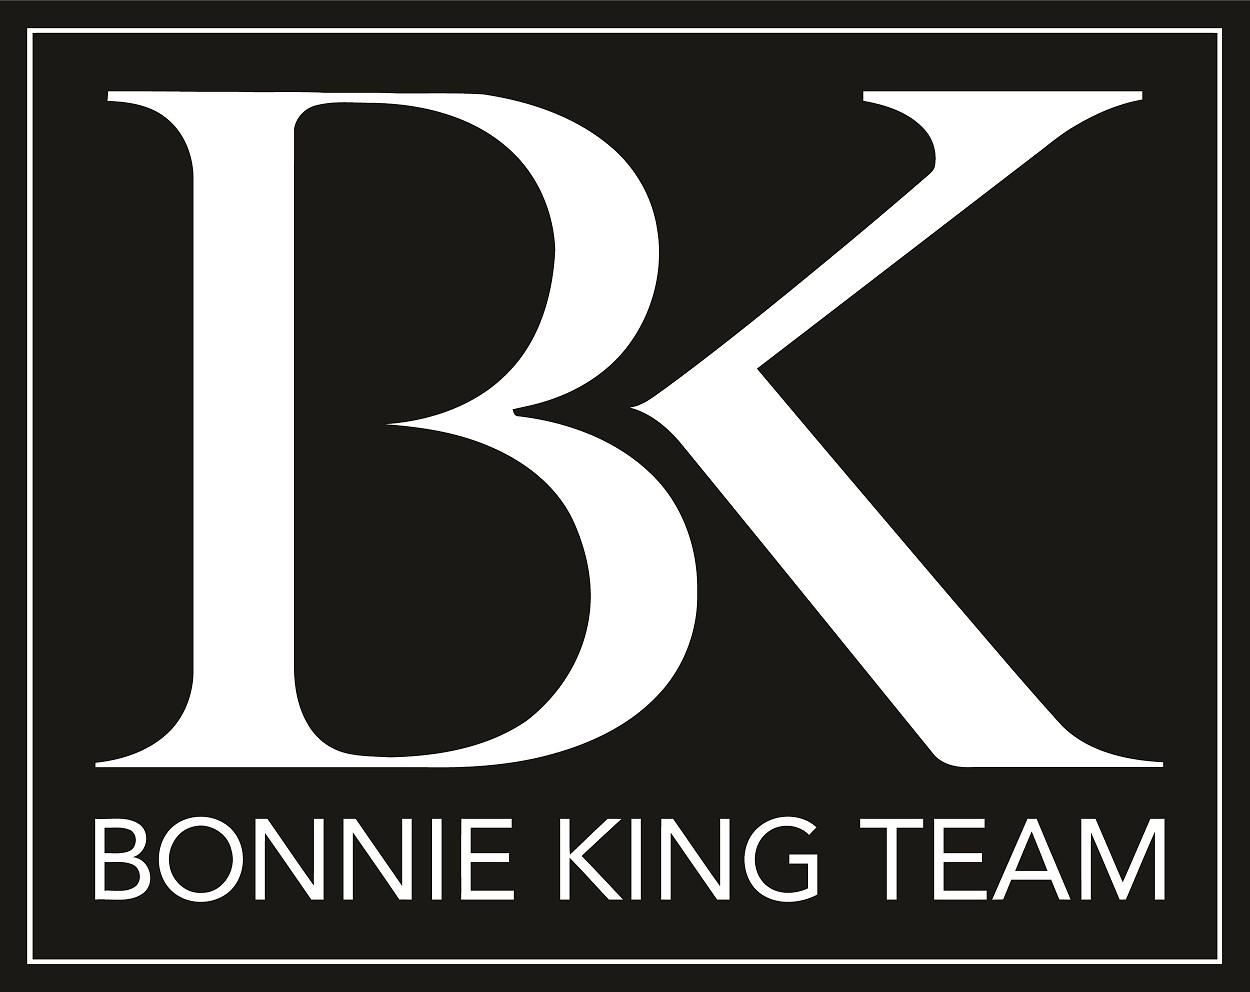 Bonnie King & Assoc Inc logo